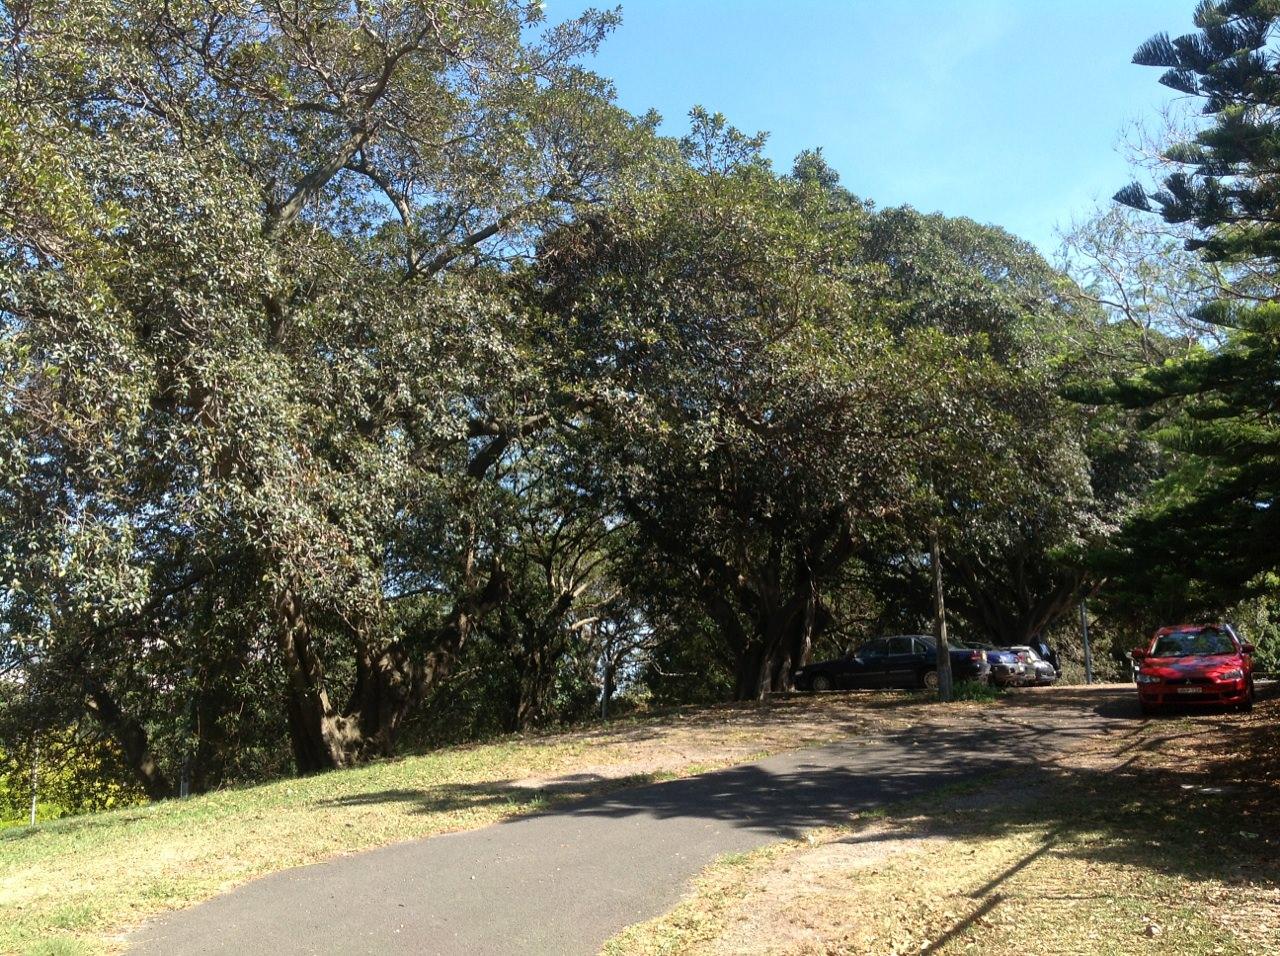 Moreton Bay Fig and Port Jackson Figs